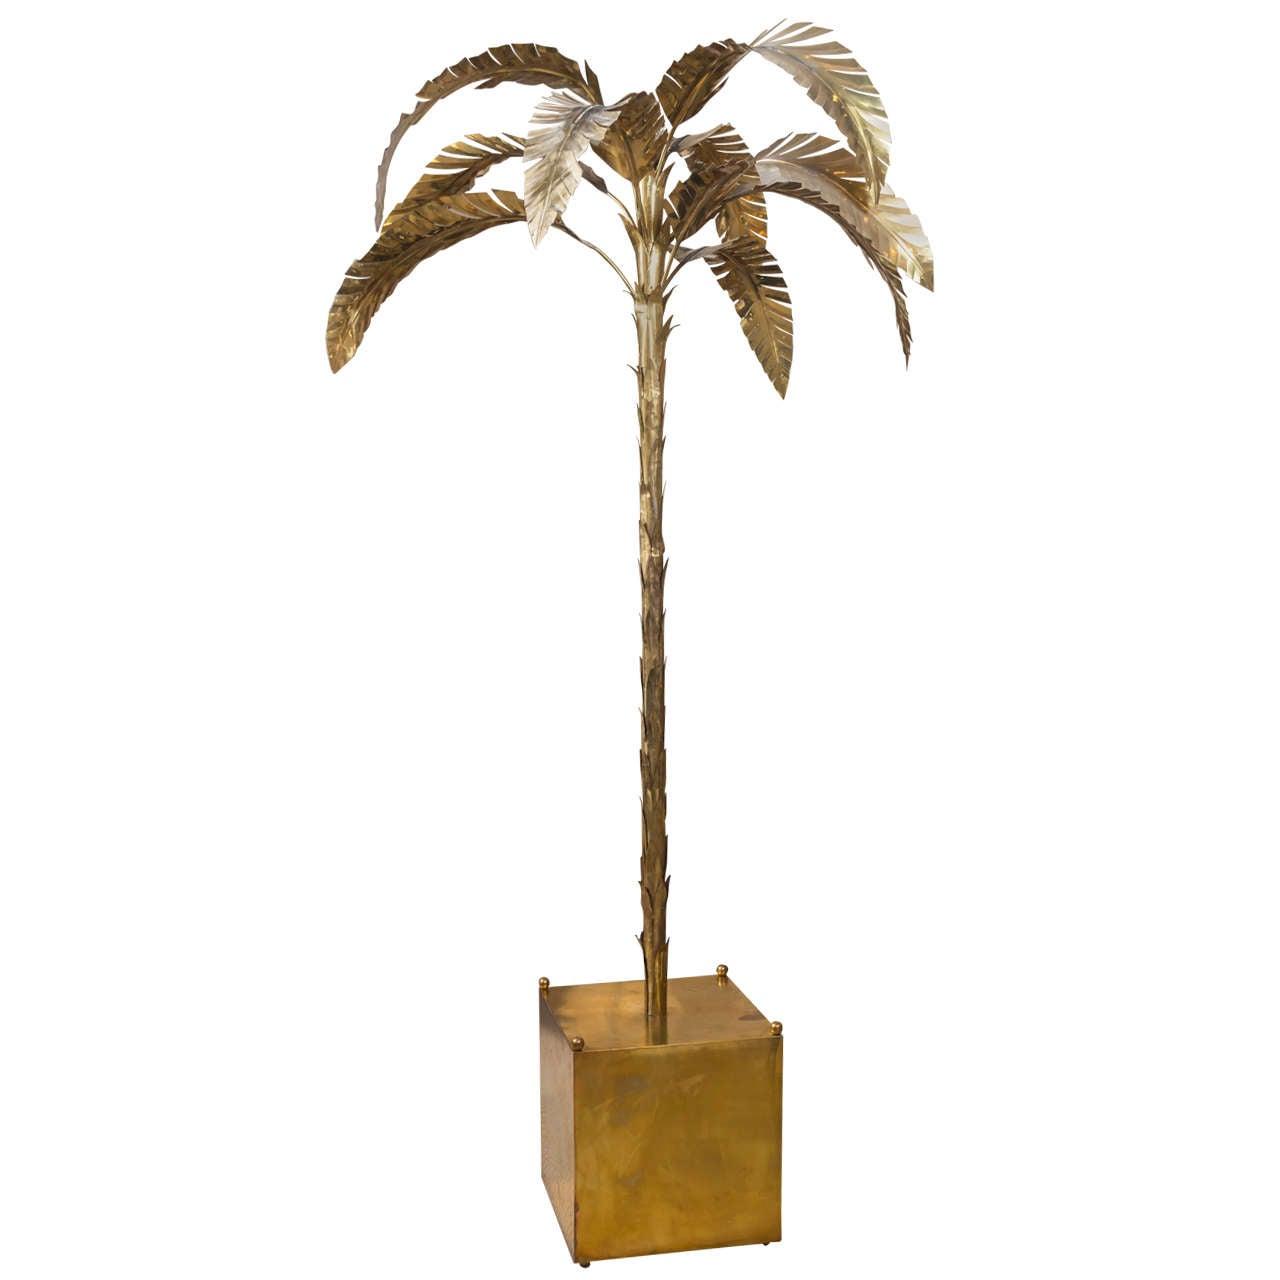 patinated brass palm tree floor lamp at 1stdibs. Black Bedroom Furniture Sets. Home Design Ideas